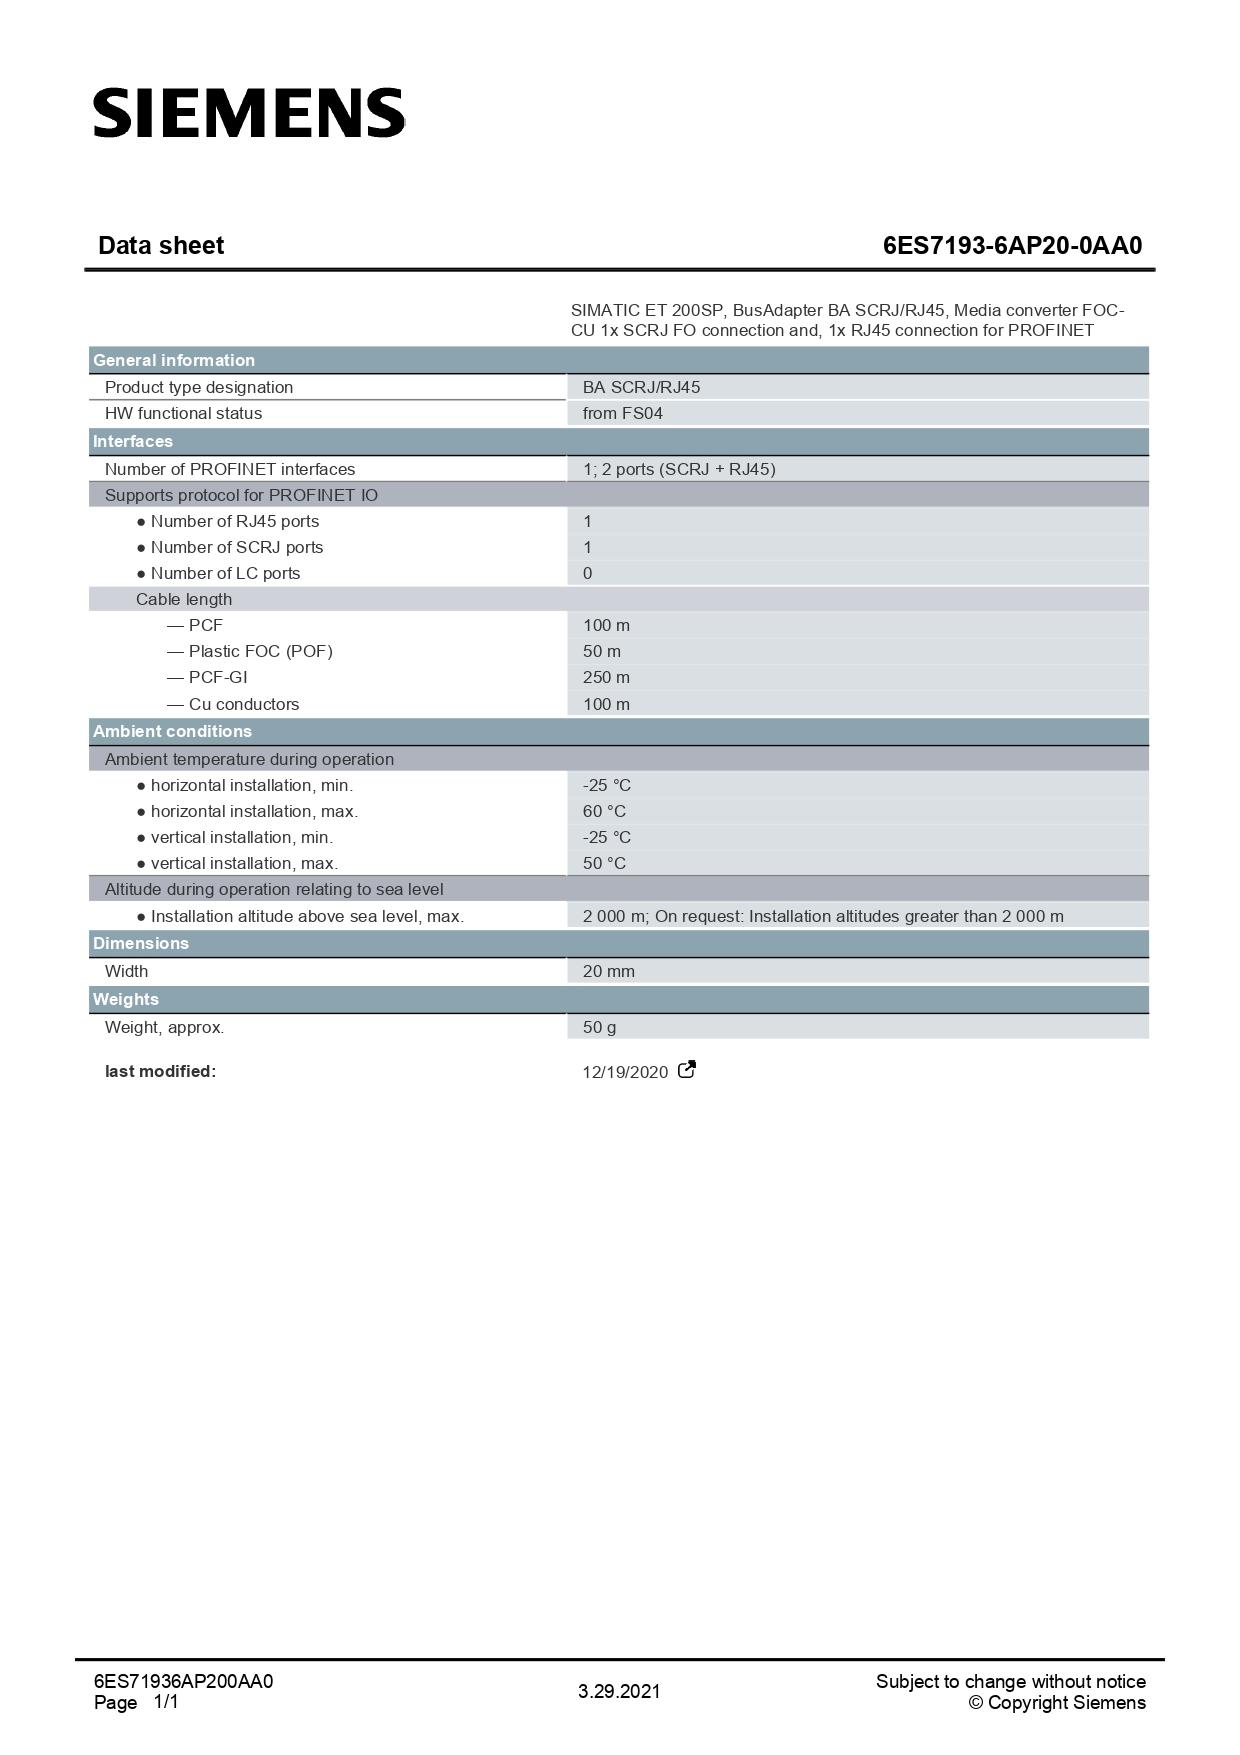 6ES71936AP200AA0_datasheet